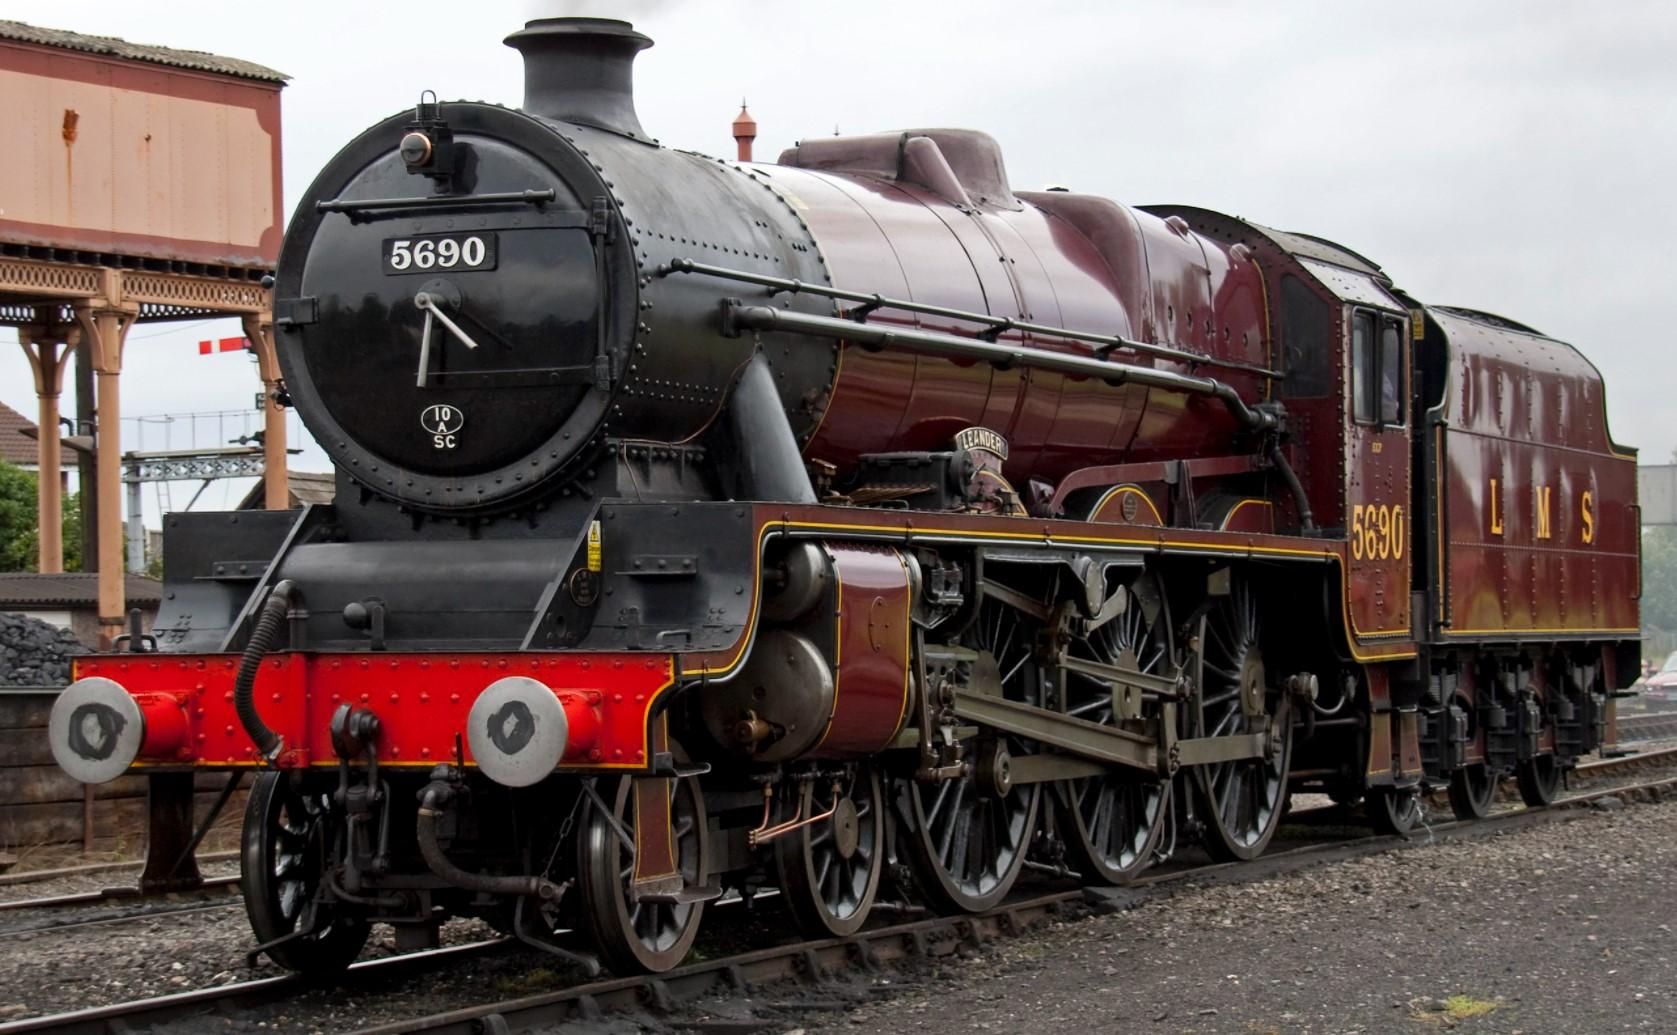 5690 'Leander' at the Severn Valley Railway in September 2010. ©Tony Hisgett